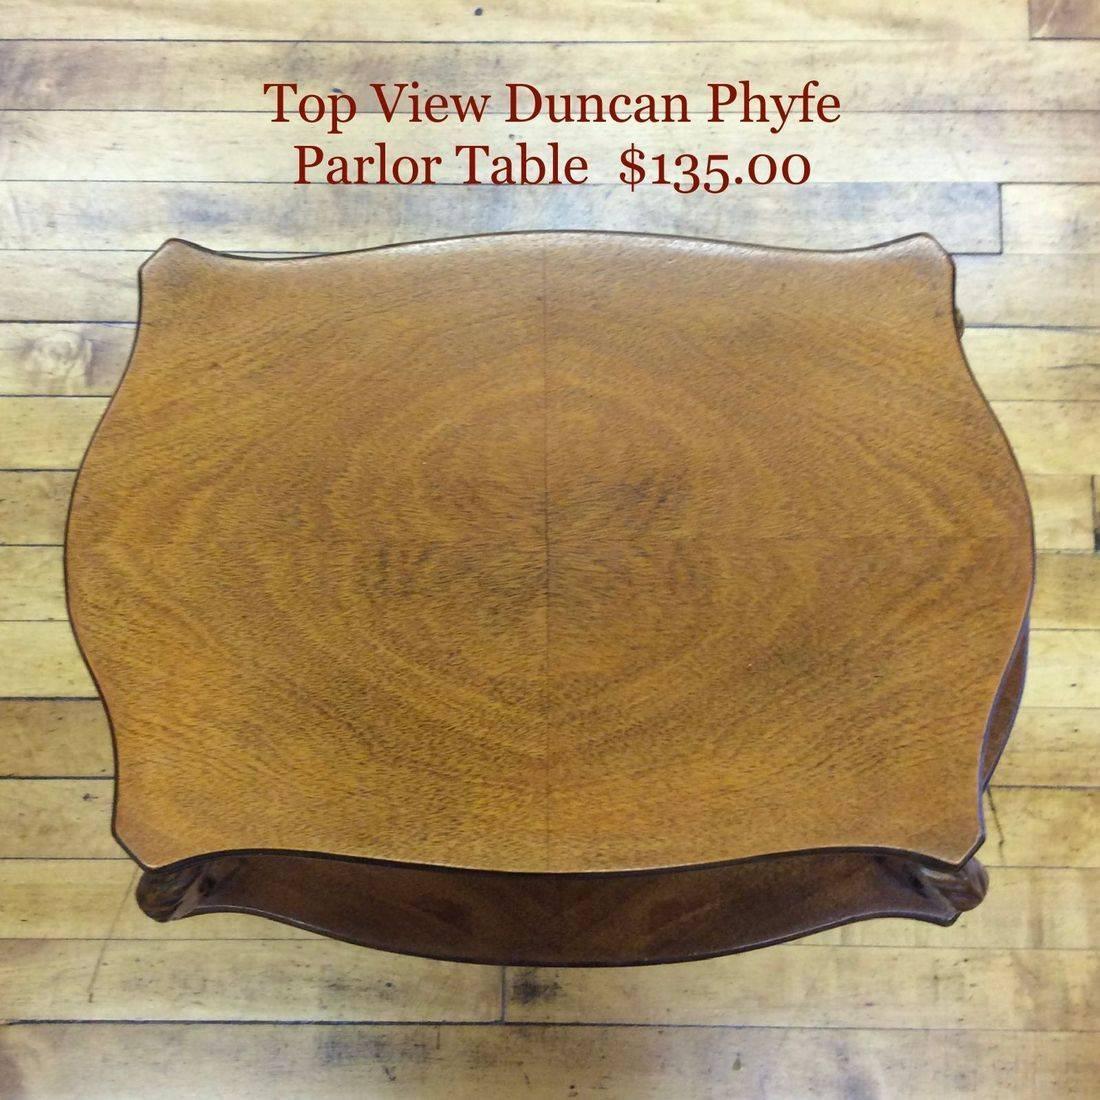 1930's/40's Unique Duncan Phyfe Table Top